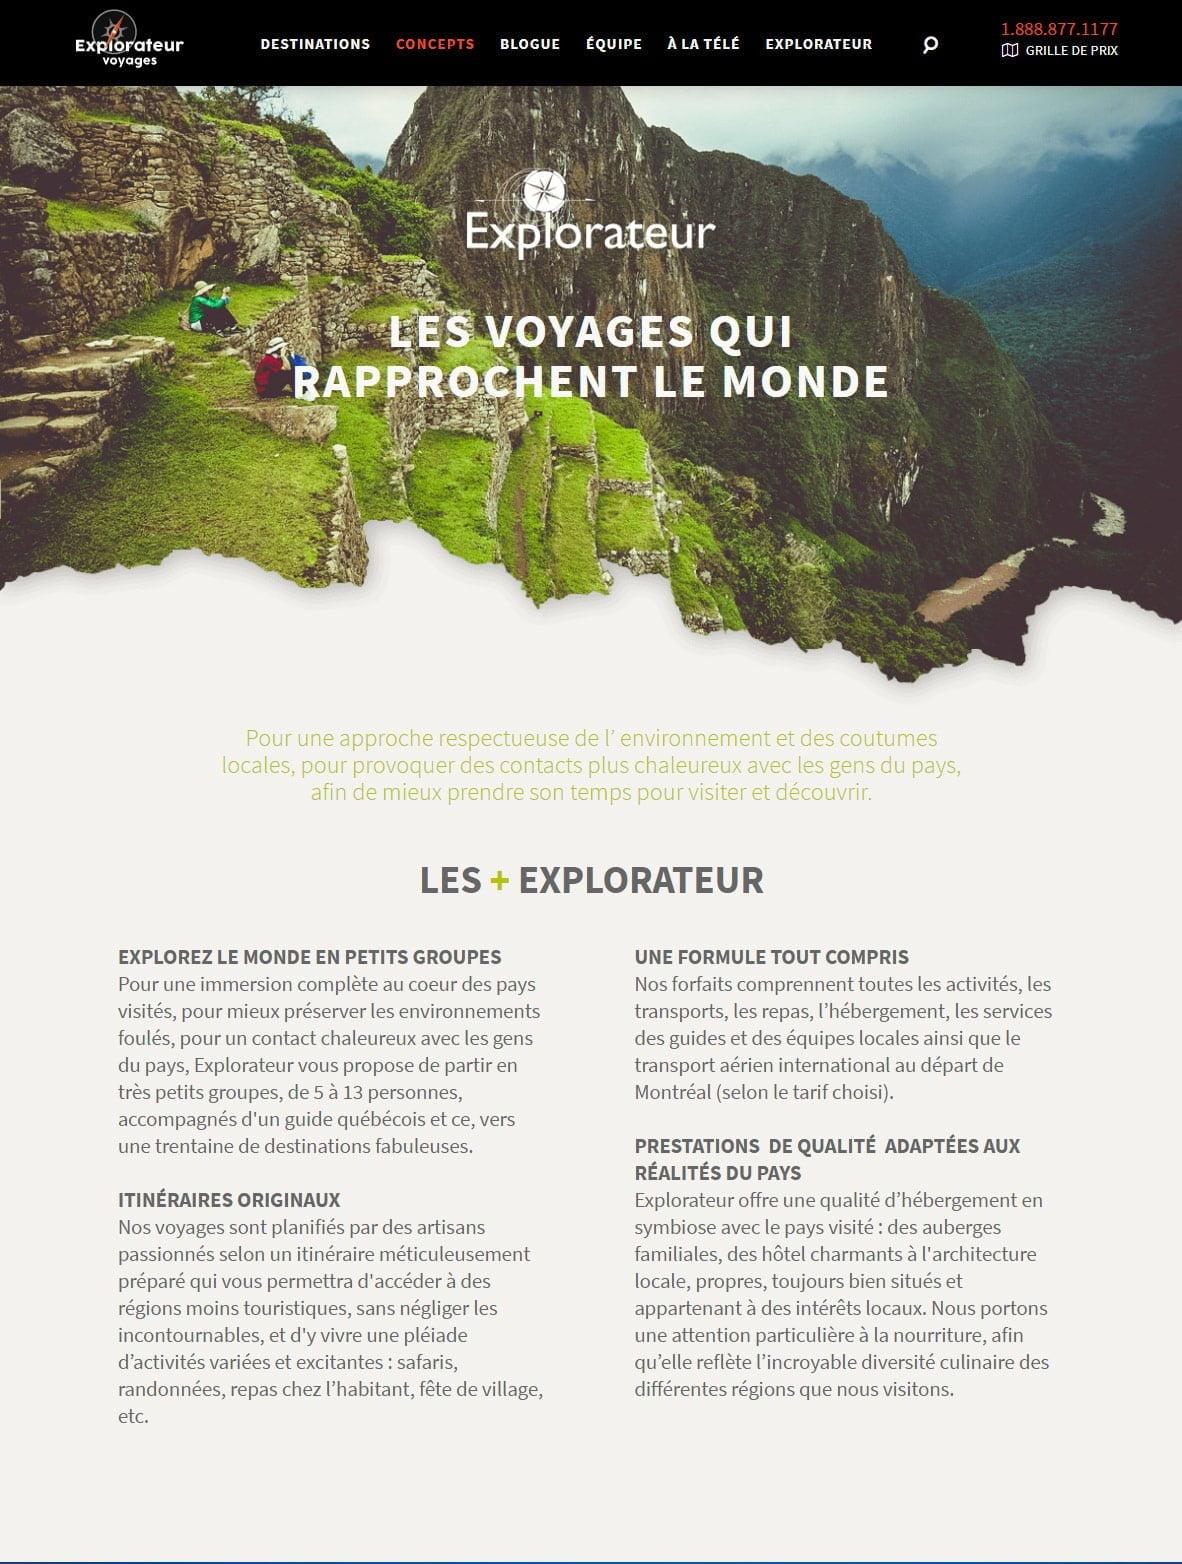 Explorateur Voyages - Portfolio 2 Tektonik